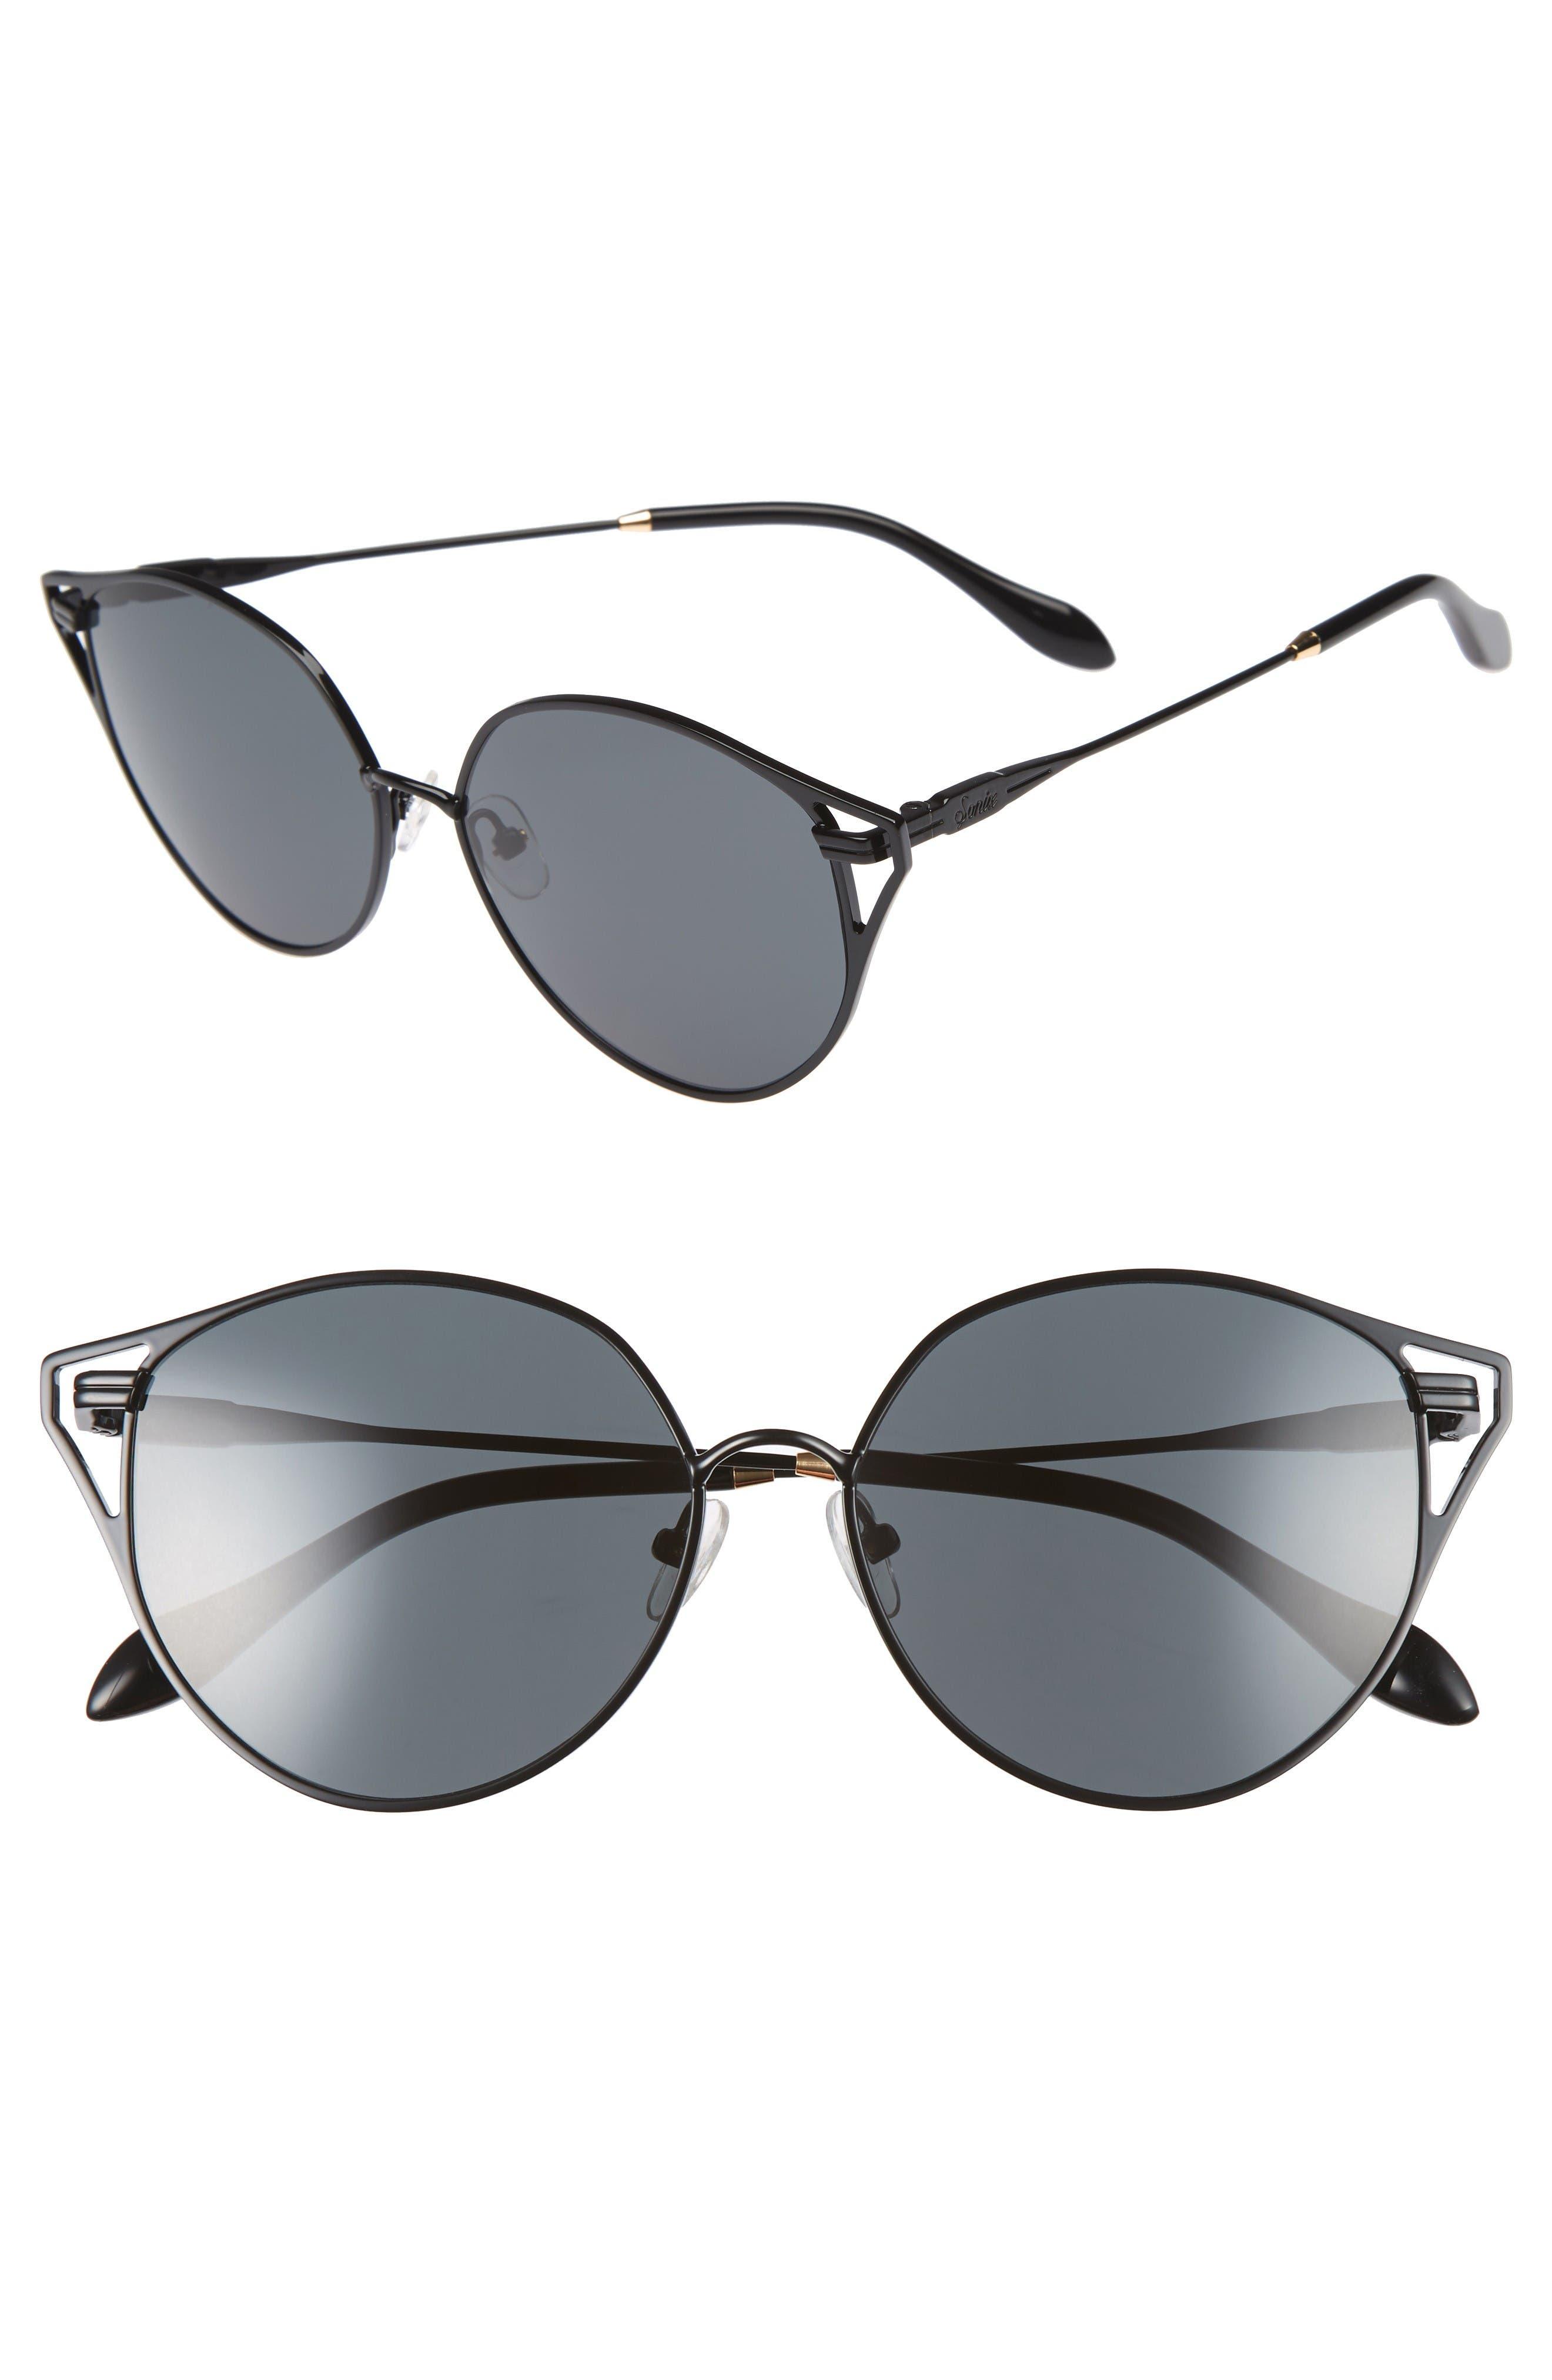 Main Image - Sonix Ibiza 55mm Cat Eye Sunglasses